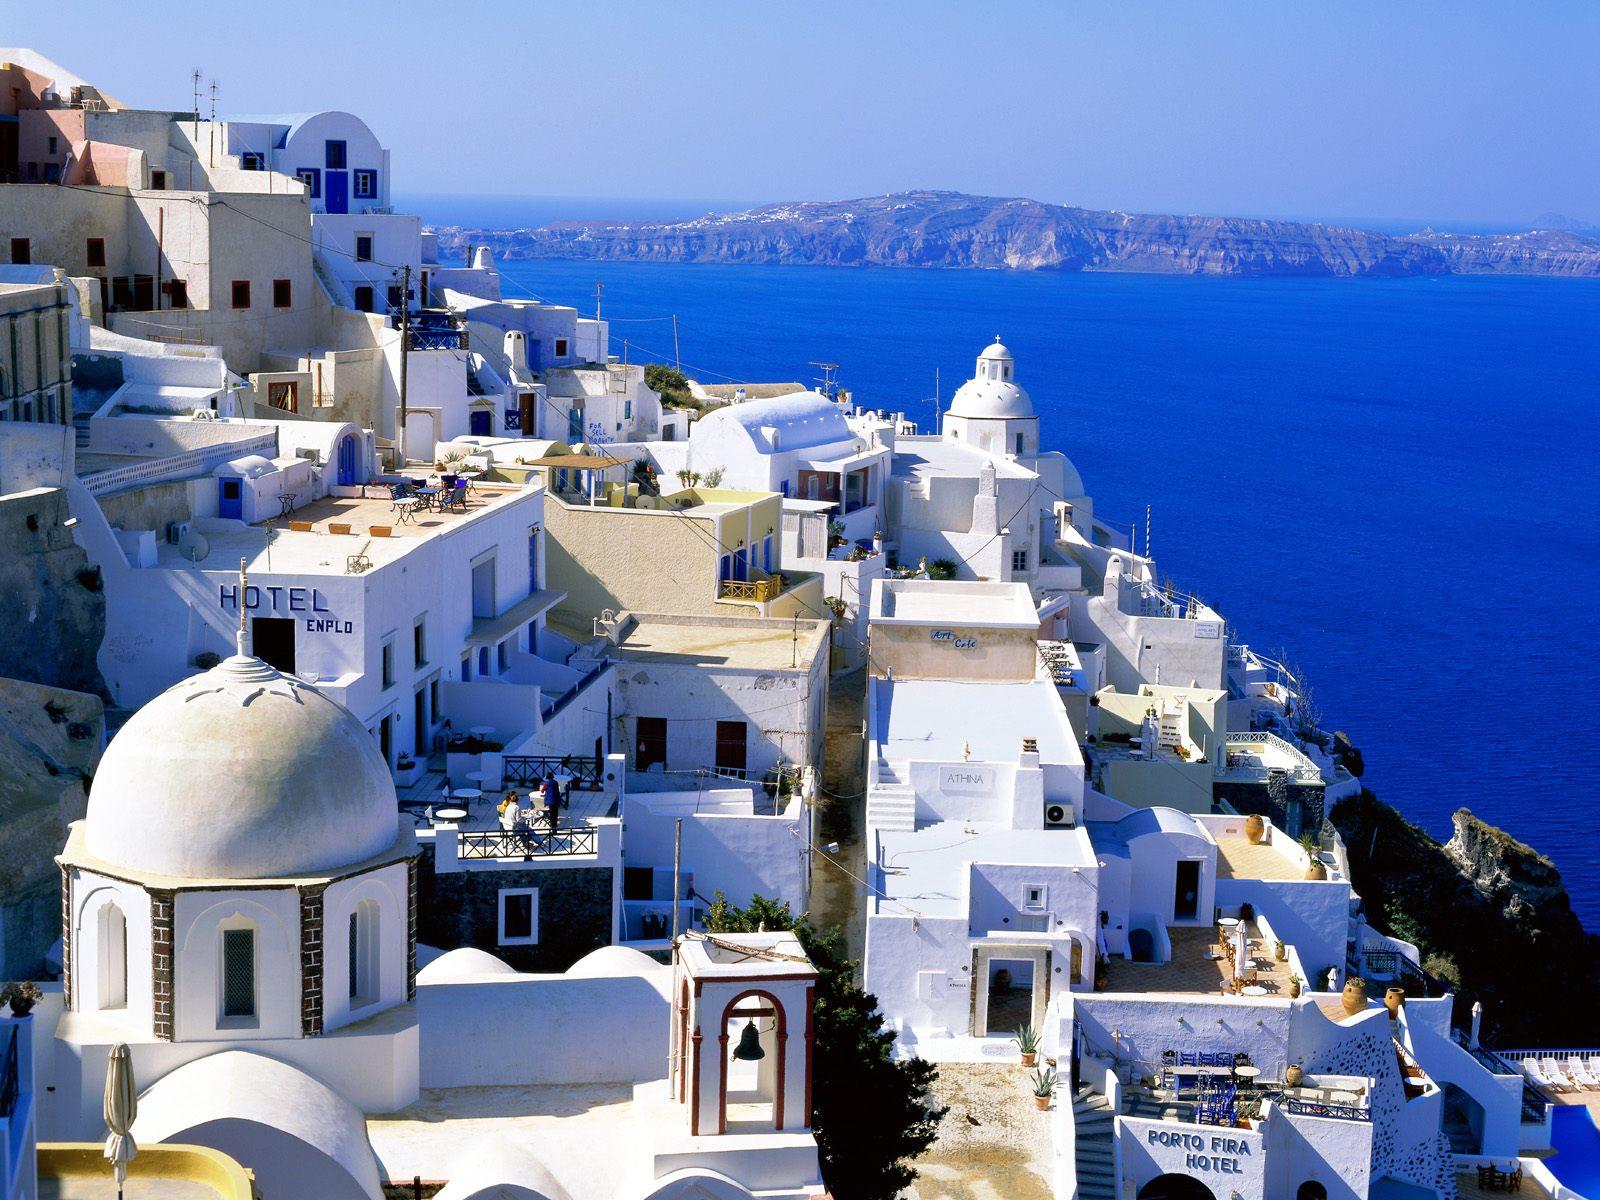 http://1.bp.blogspot.com/-dF3dTfAjJkg/TkPNp8Lc8YI/AAAAAAAAACI/4lhXSvxMBcw/s1600/Greece+Island.jpg